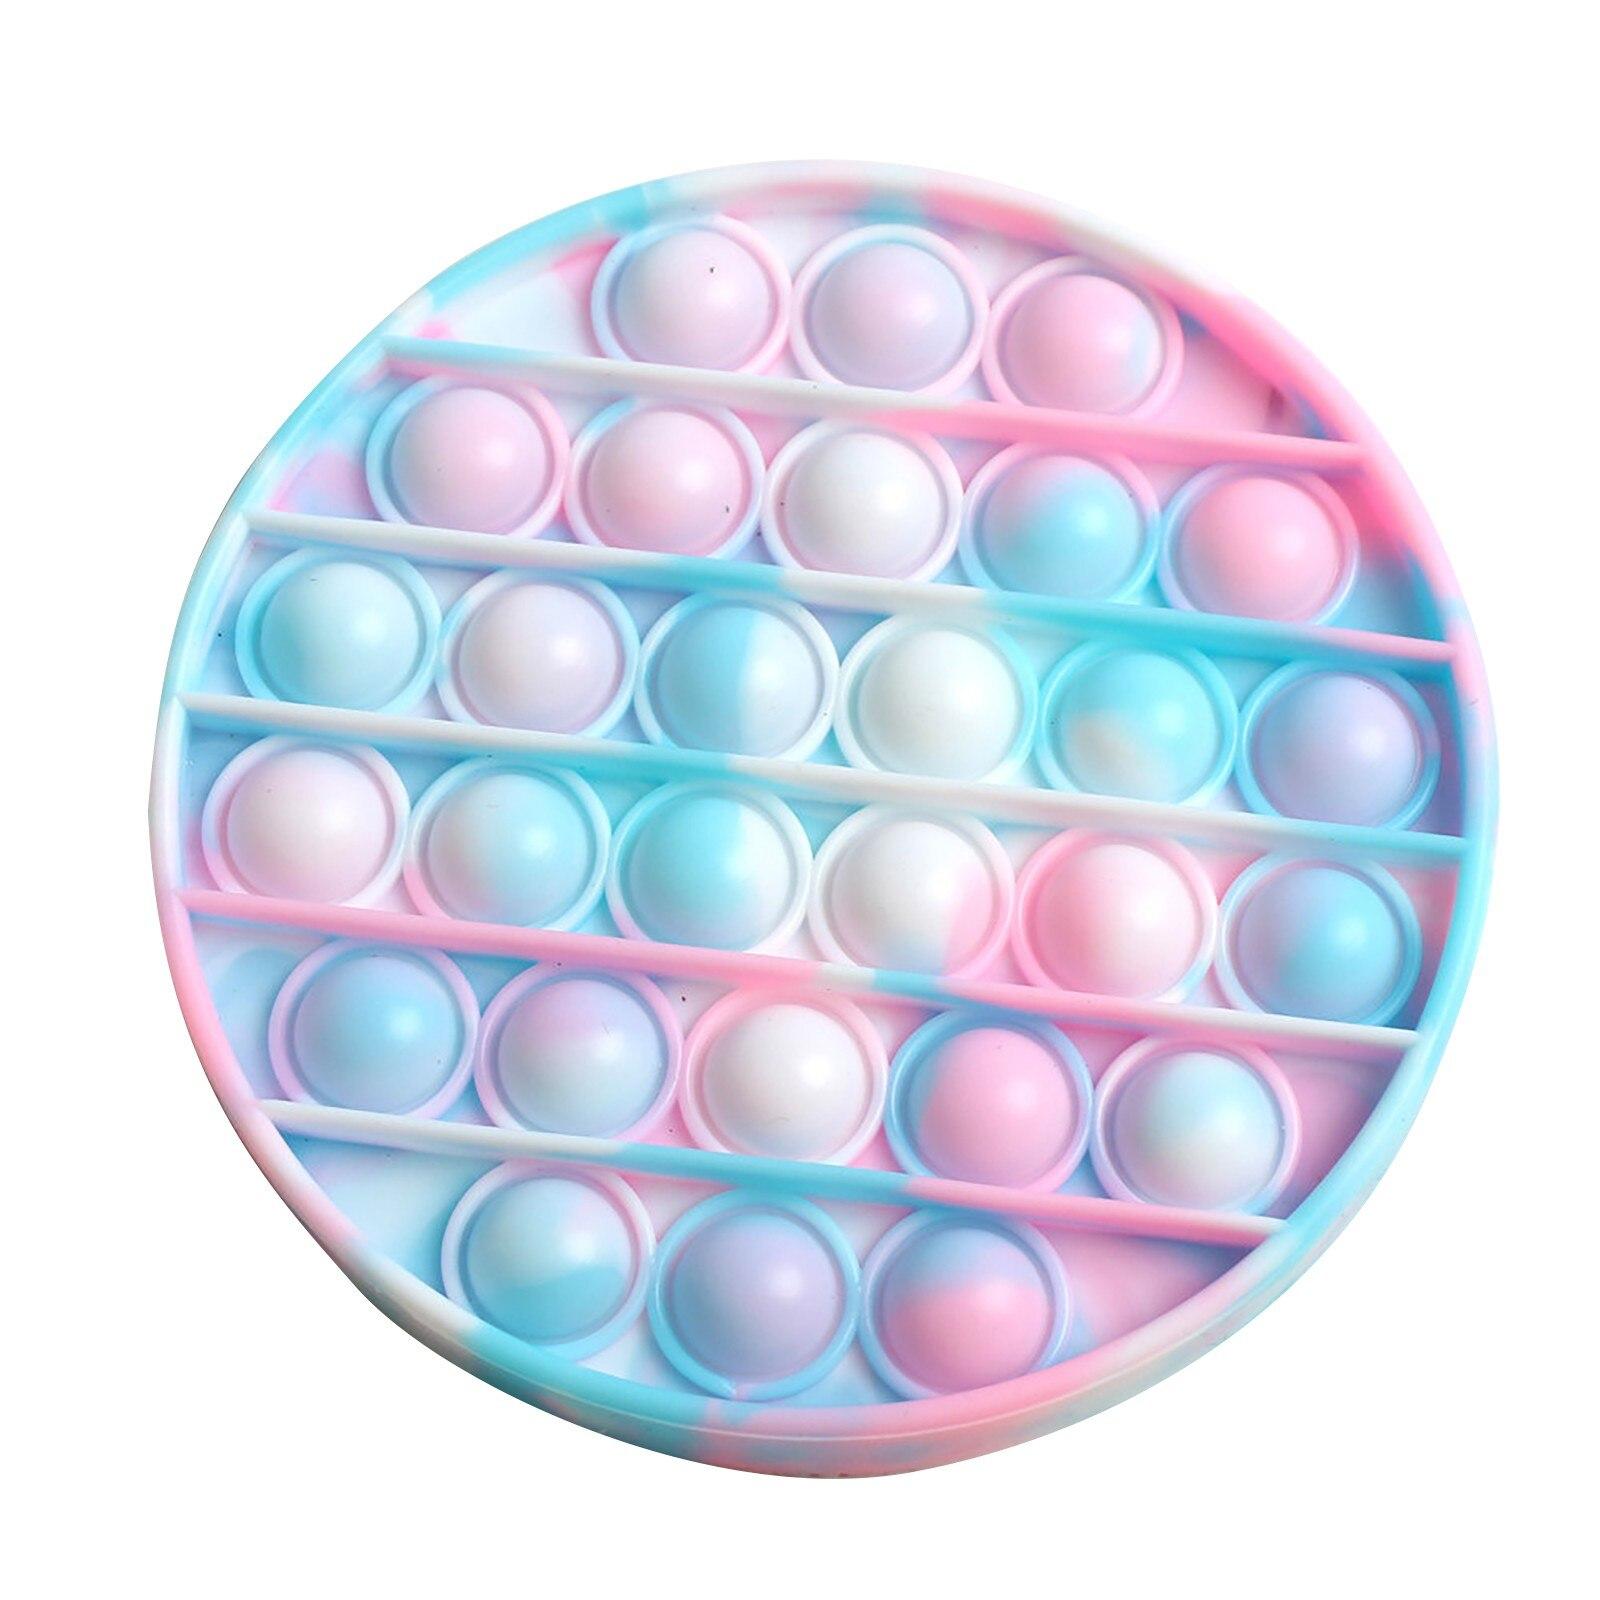 PopIt Hot Push Bubble Fidget Toys Adult Stress Relief Toy Antistress PopIt Soft Squishy Anti-Stress Gift Anti Stress Box ??? ??* img5